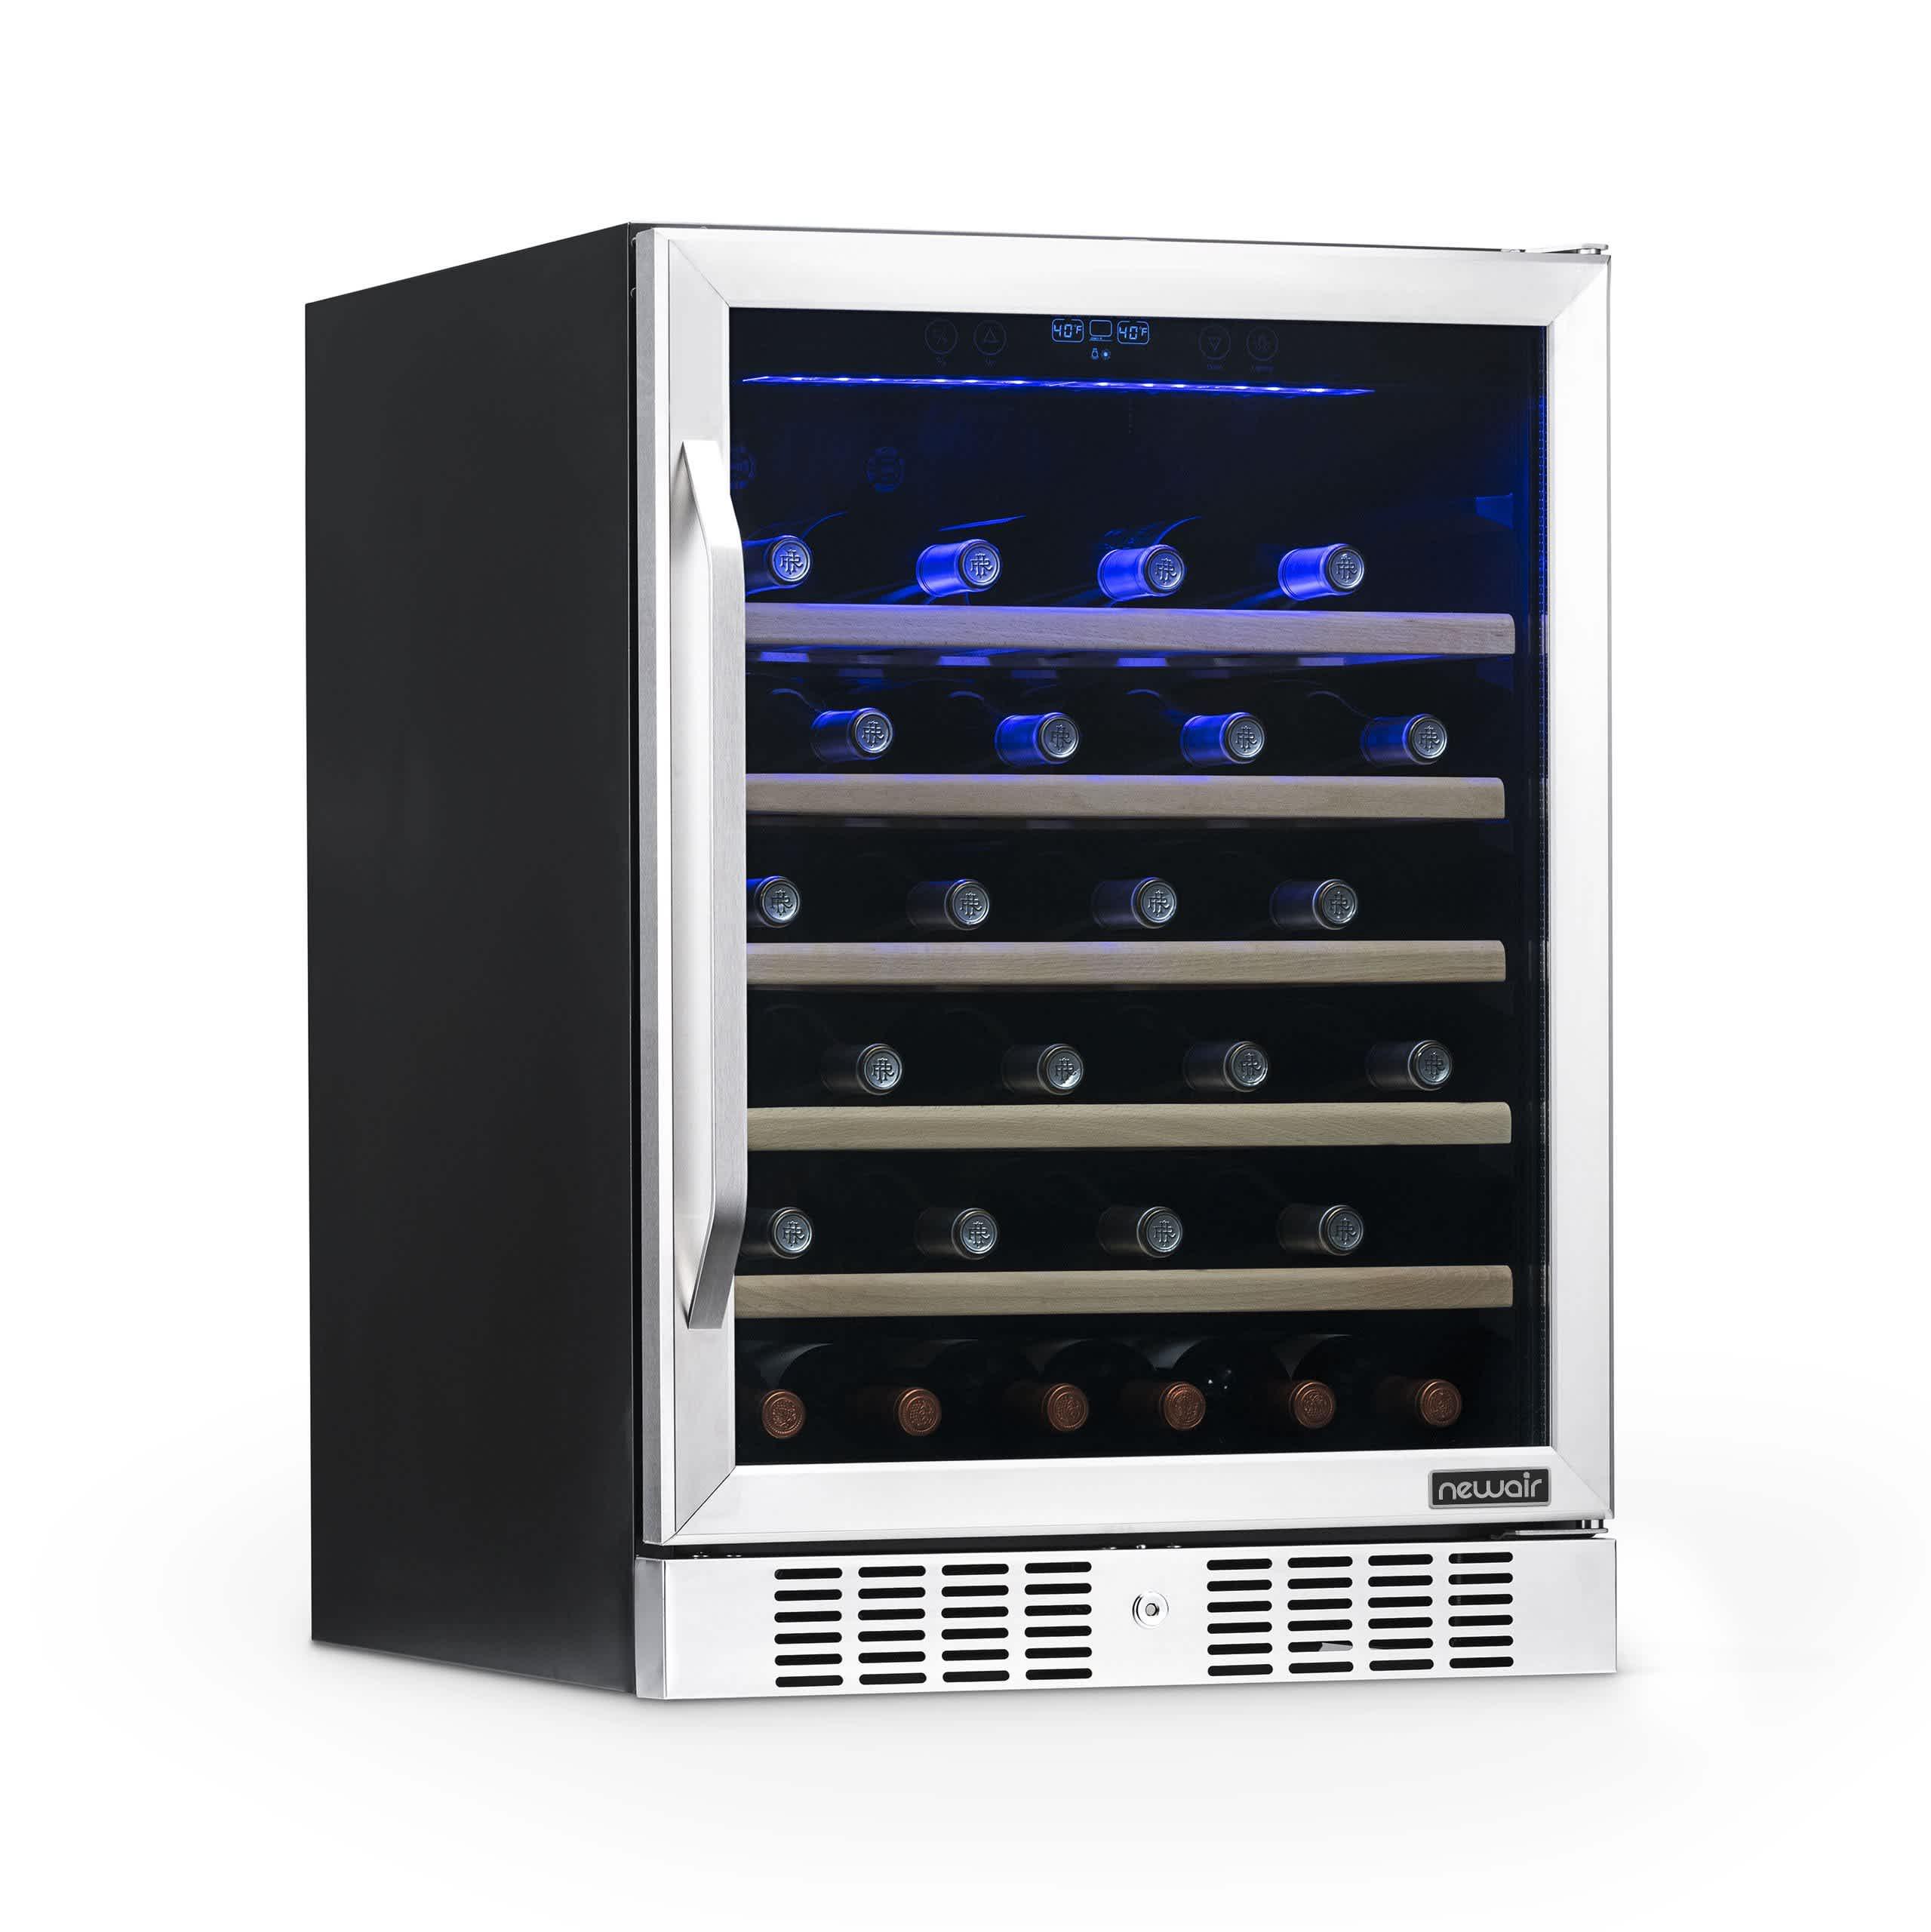 NewAir 24inch Built-In 52 Bottle Compressor Wine Fridge in Stainless Steel